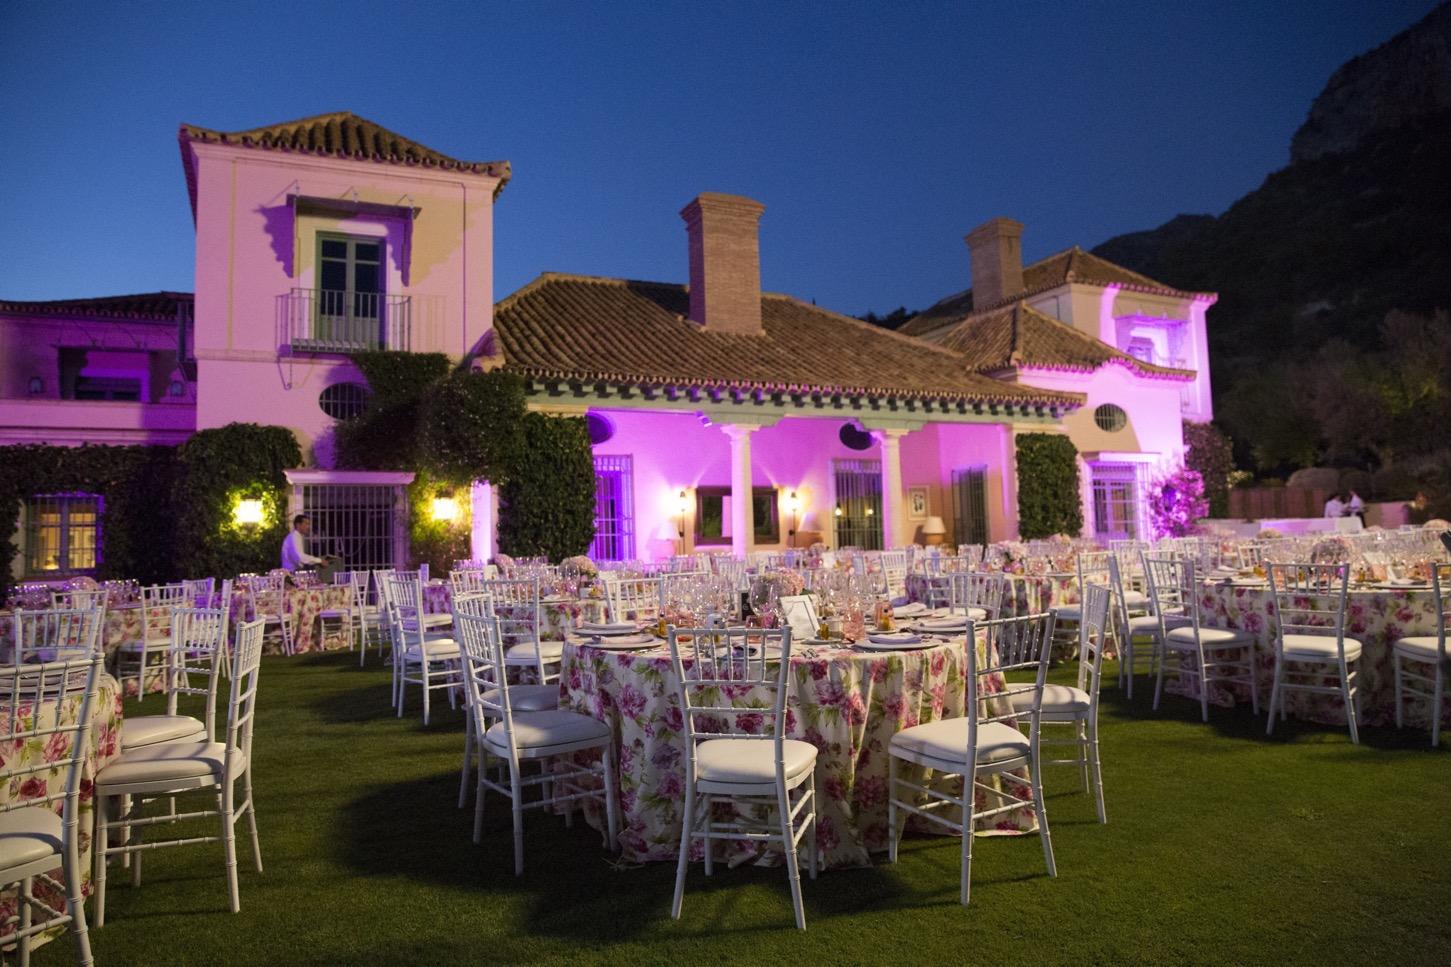 Si-Quiero-Wedding-Planner-By-Sira-Antequera-Sonia-Carlos-13